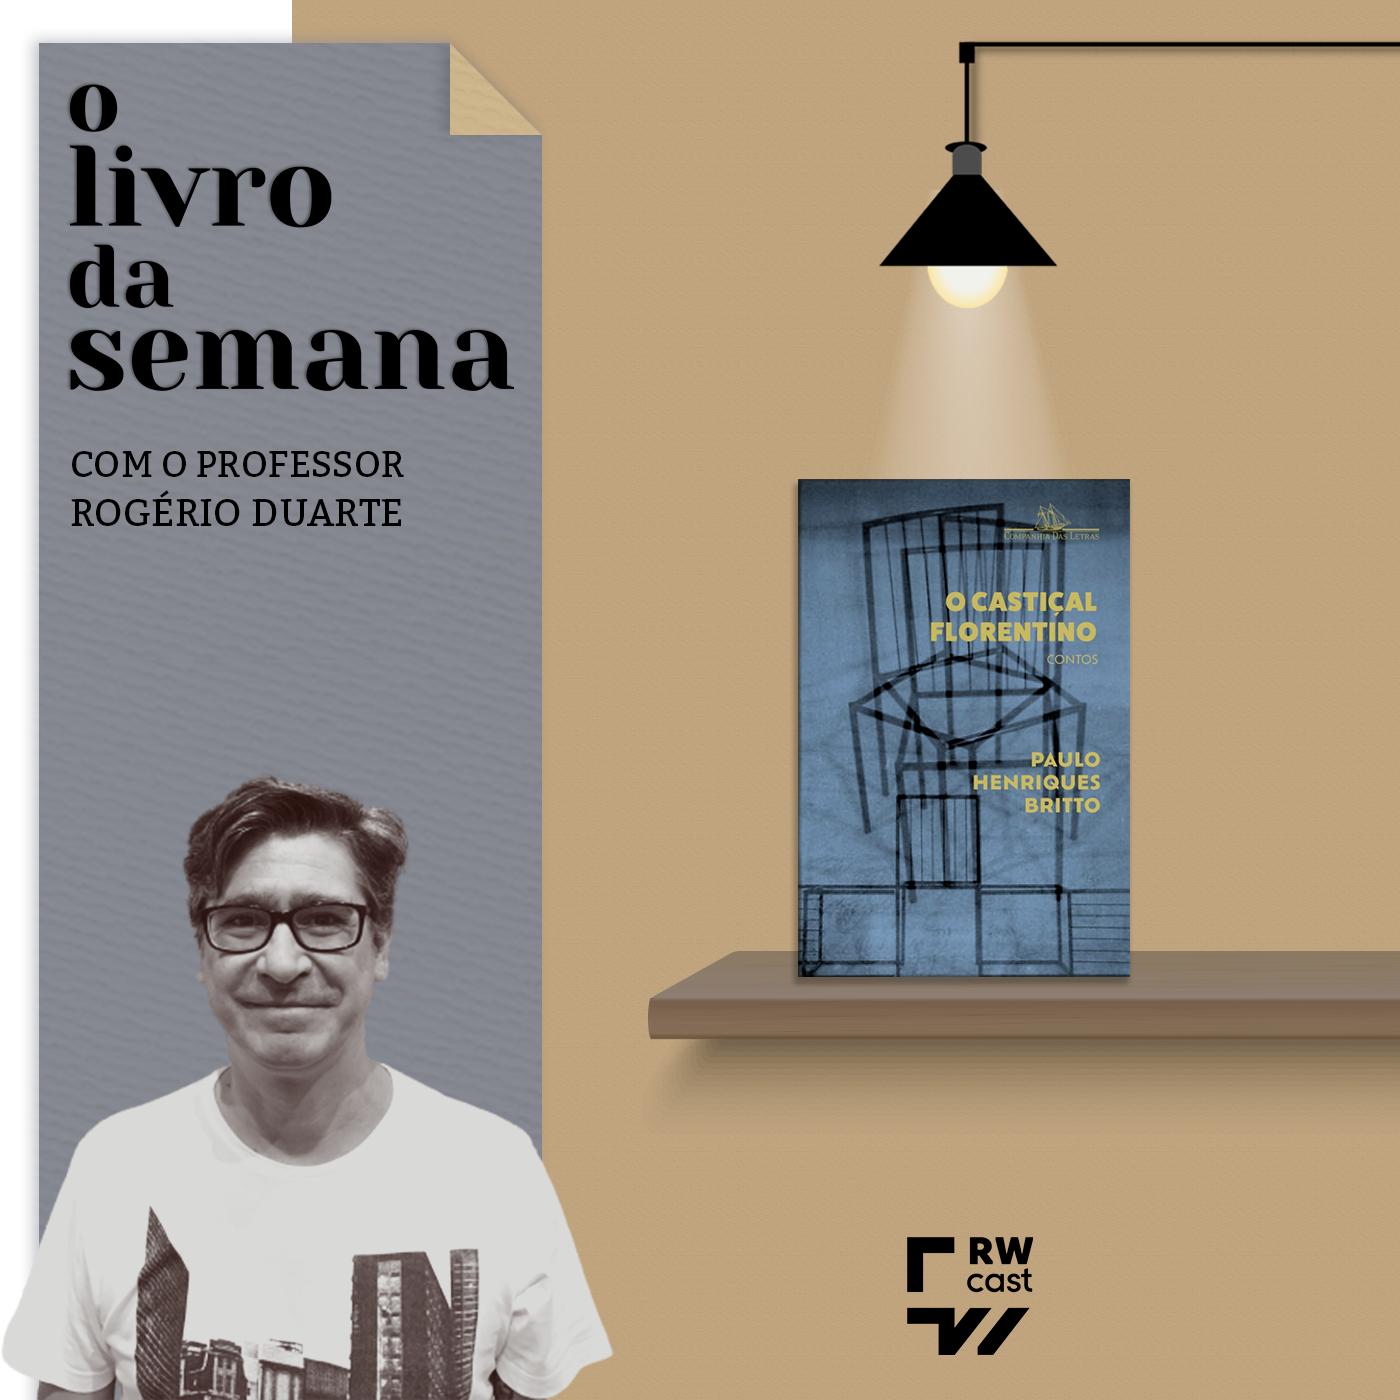 O fascínio do cotidiano nos contos de Paulo Henriques Britto